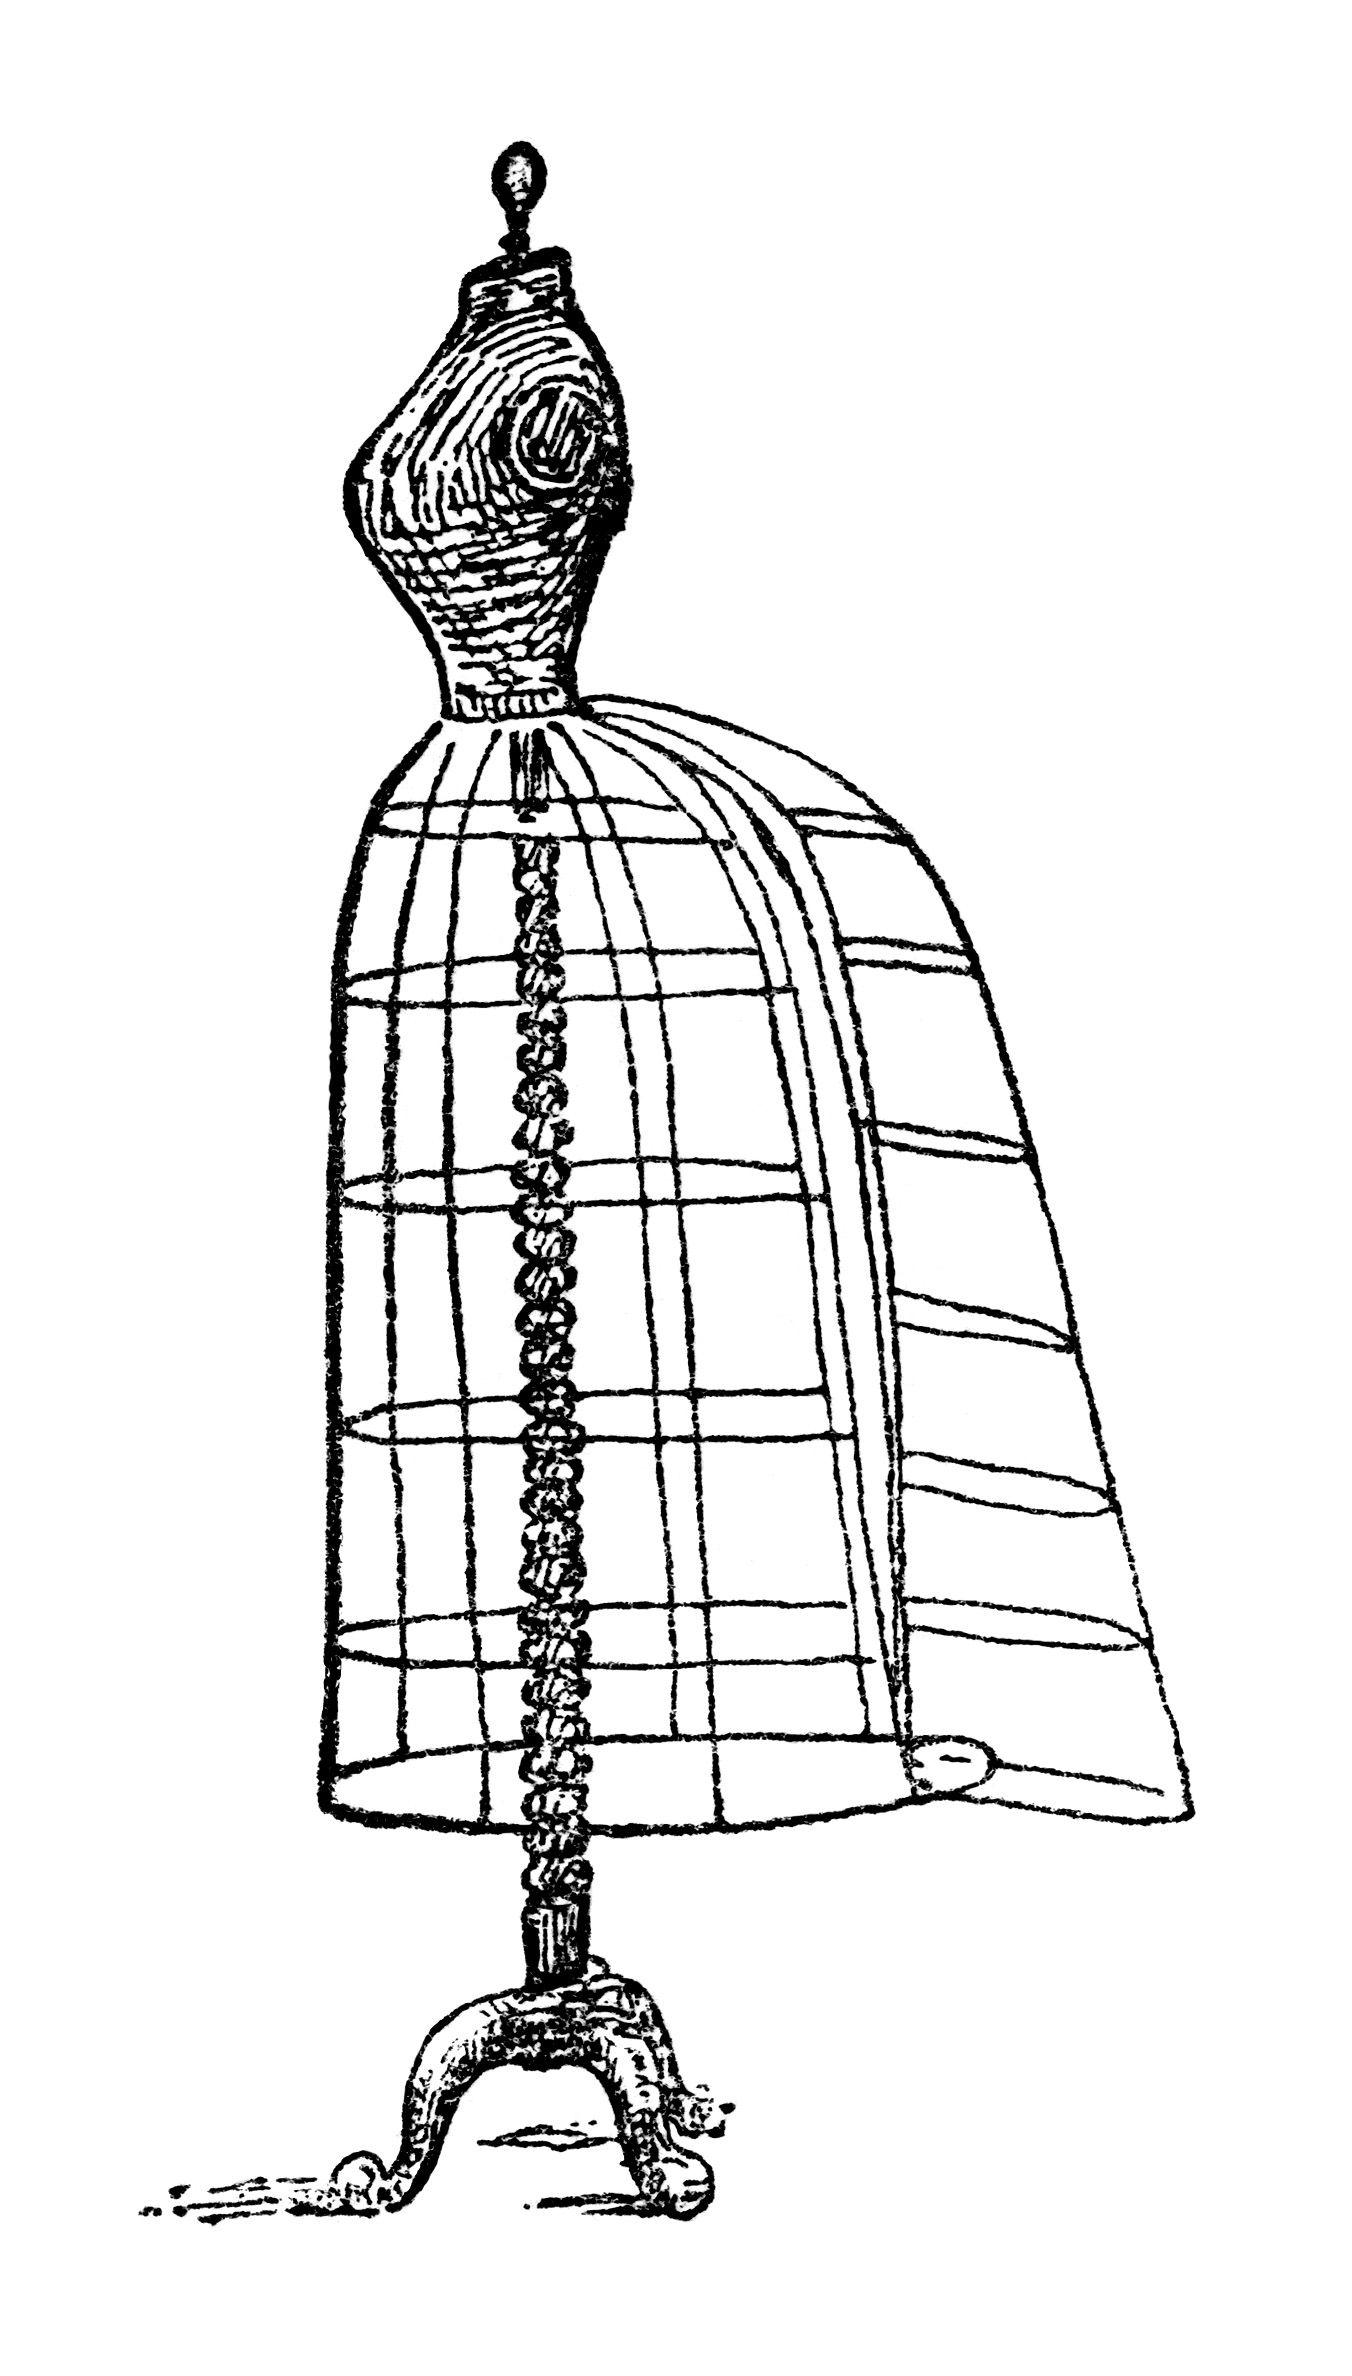 Sewing Machine Clip Art Black And White